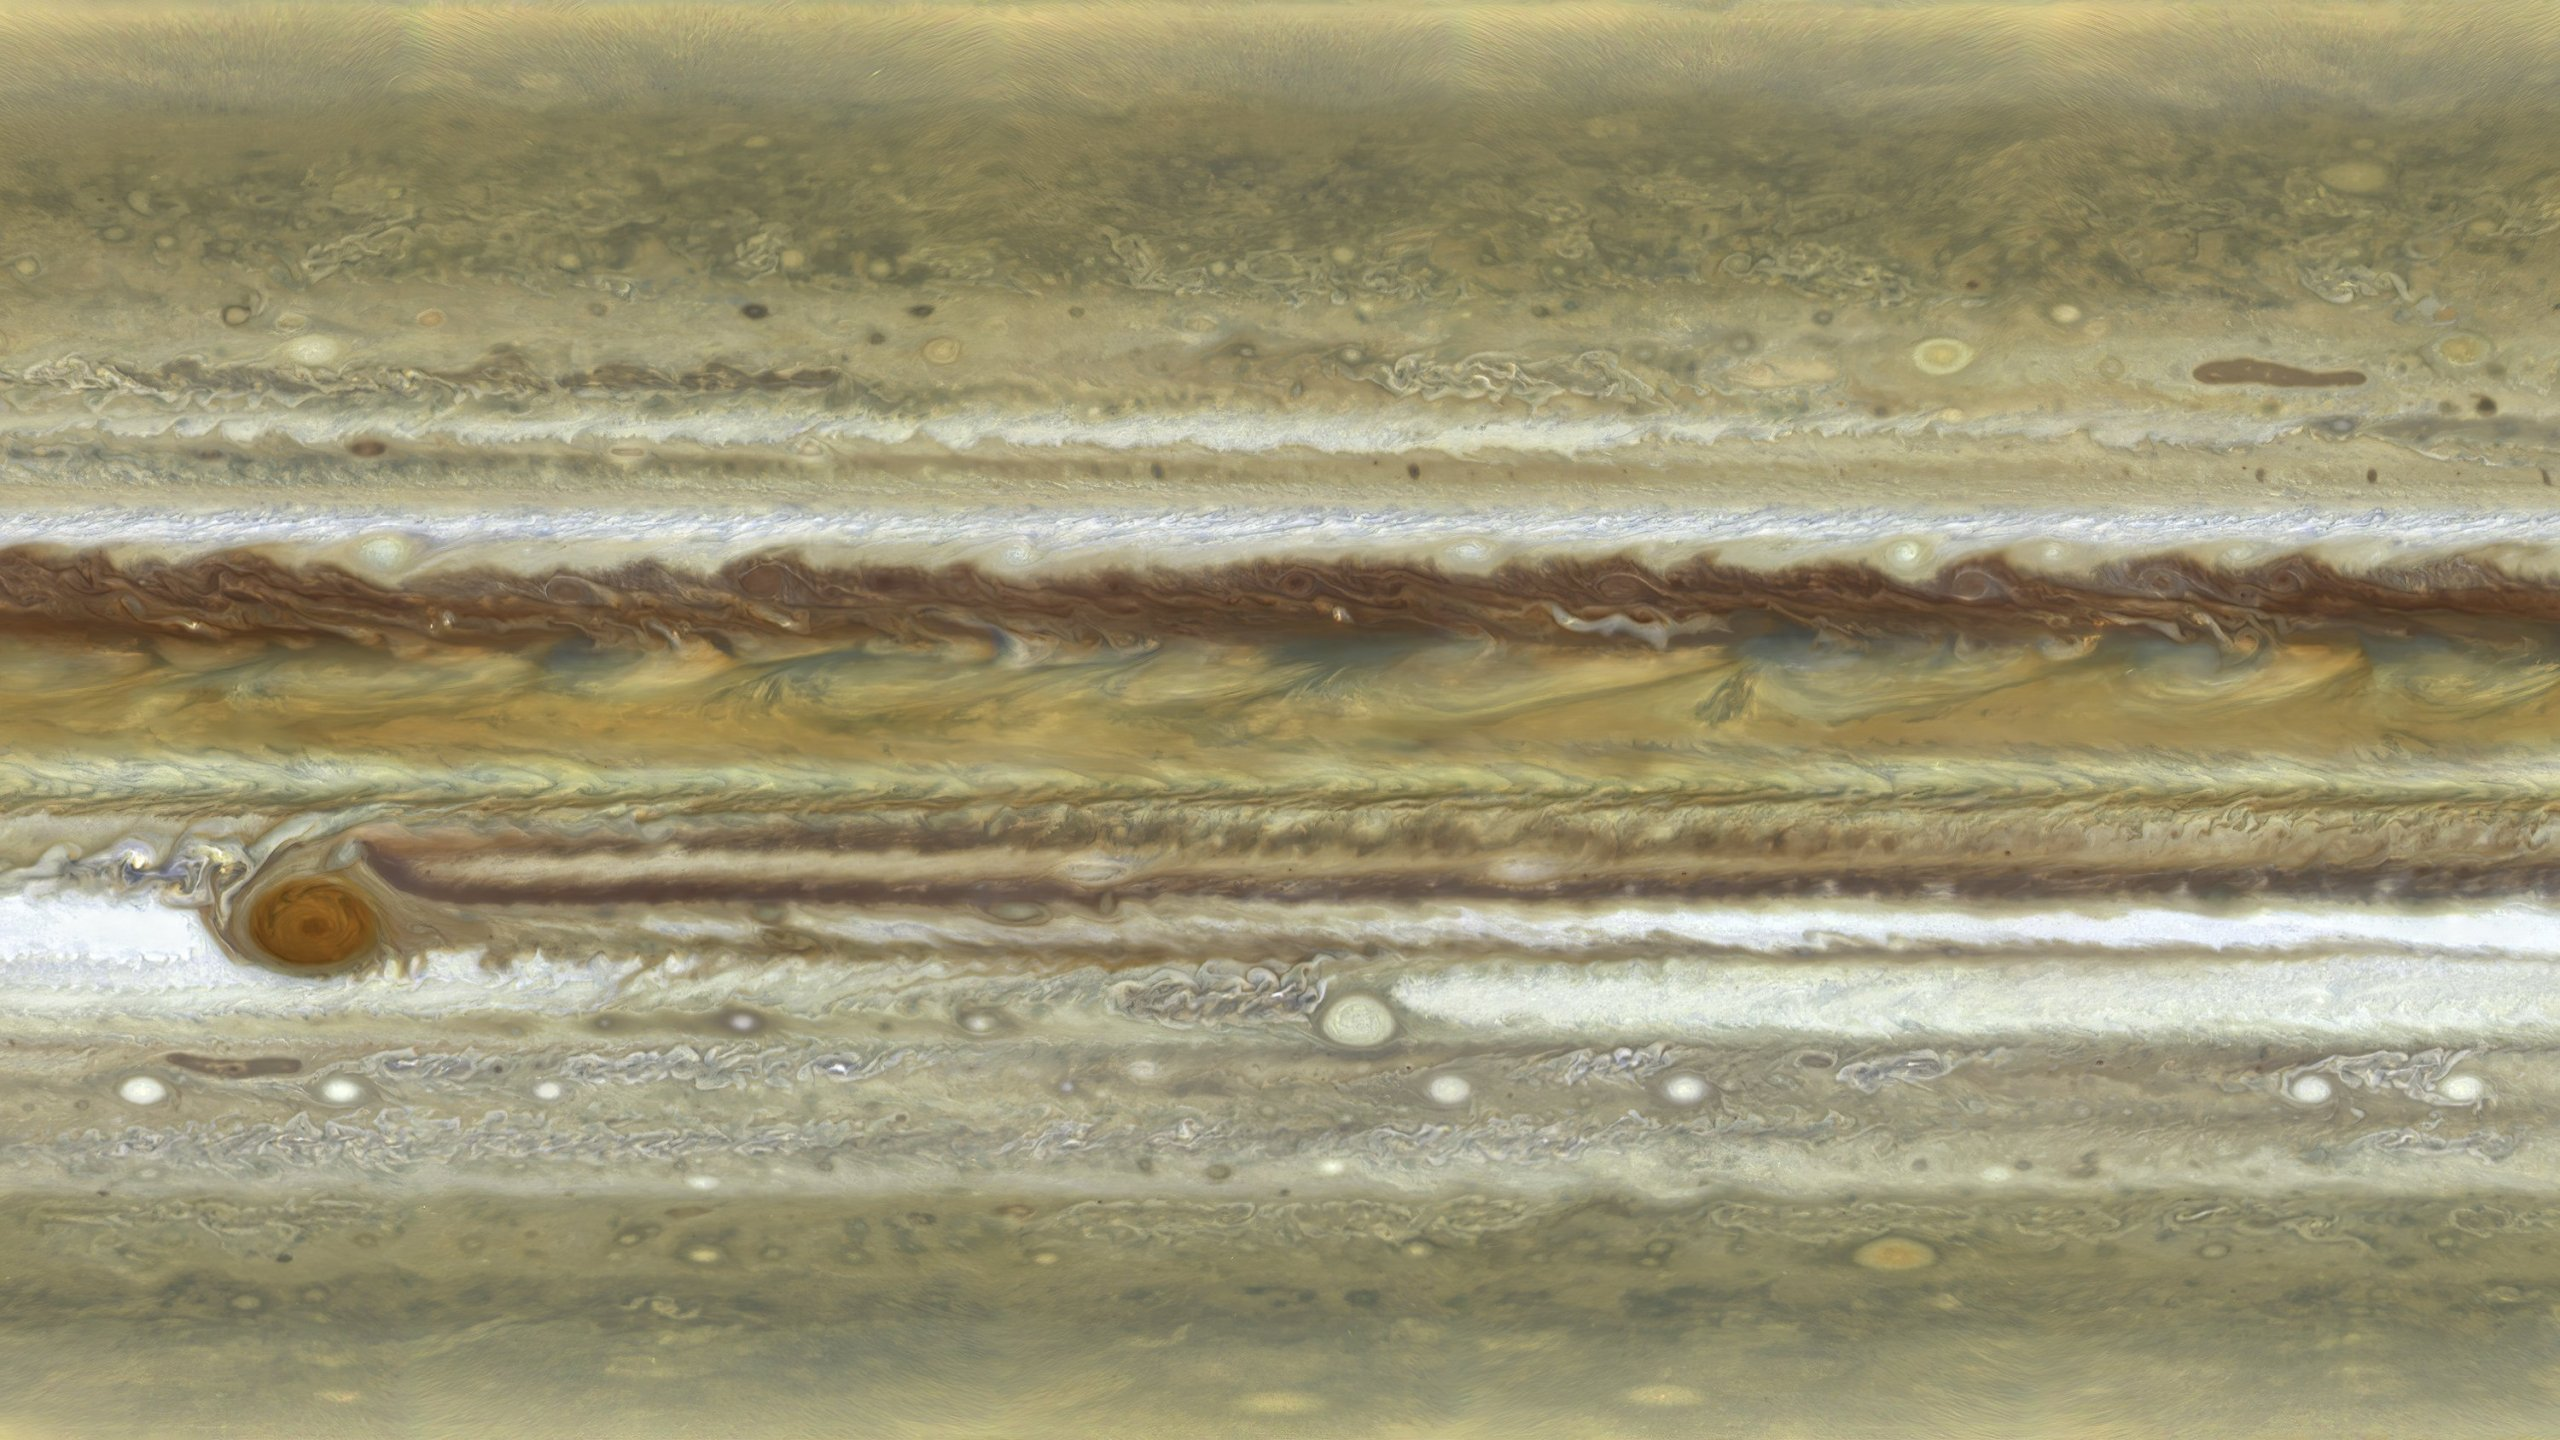 A closer look at Jupiter's clouds and atmosphere. (Credit: A Simon/MH Wong/ESA/Hubble/NASA